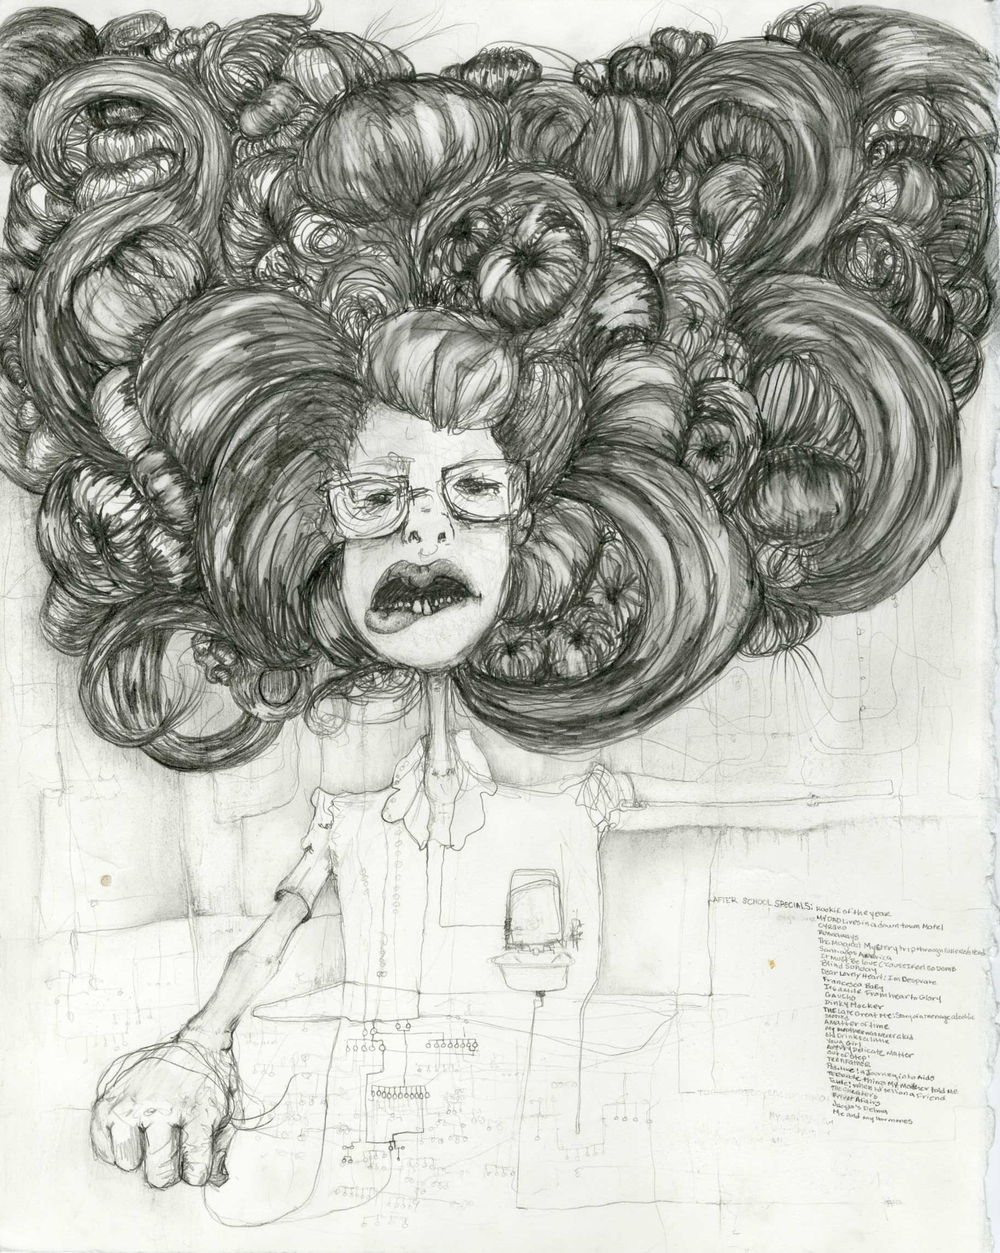 felipe's drawing028.jpg